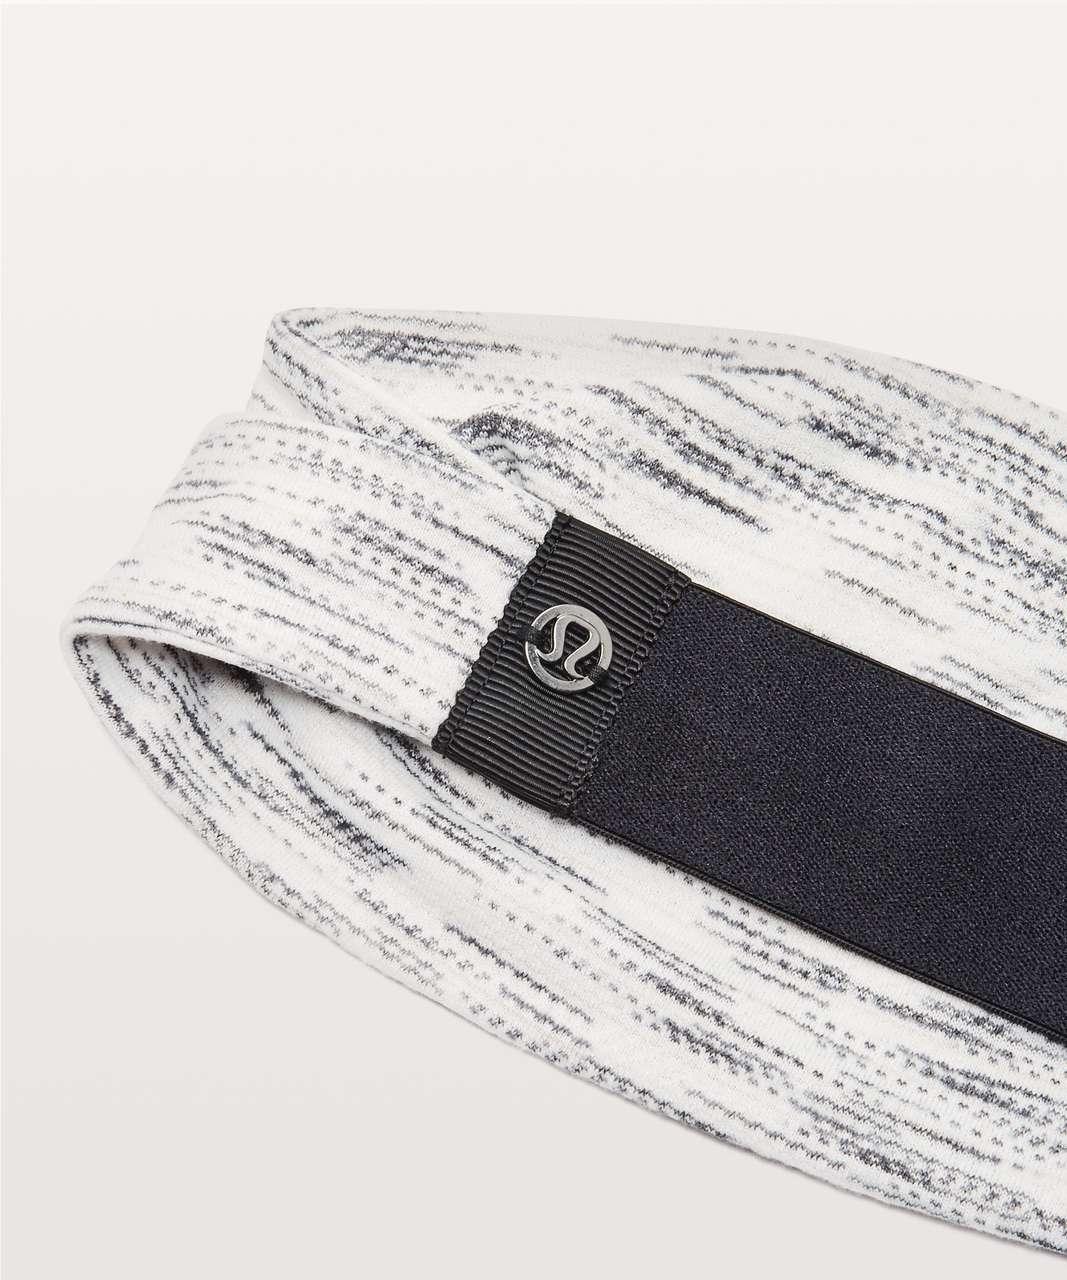 Lululemon Fringe Fighter Headband - Tiger Space Dye Black White